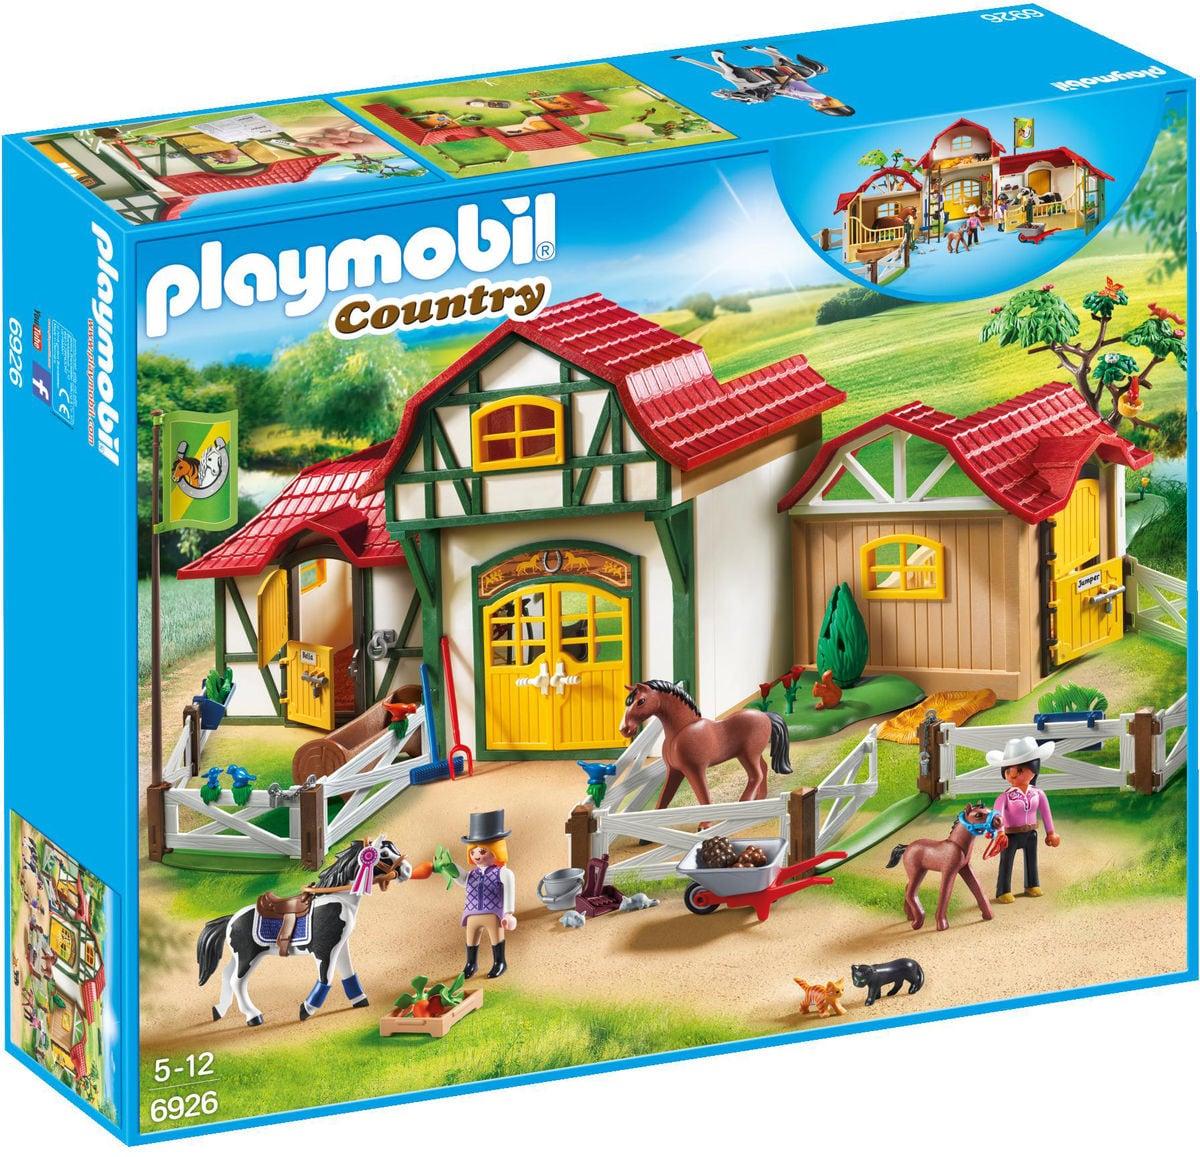 Playmobil 6926 Grosser Reiterhof